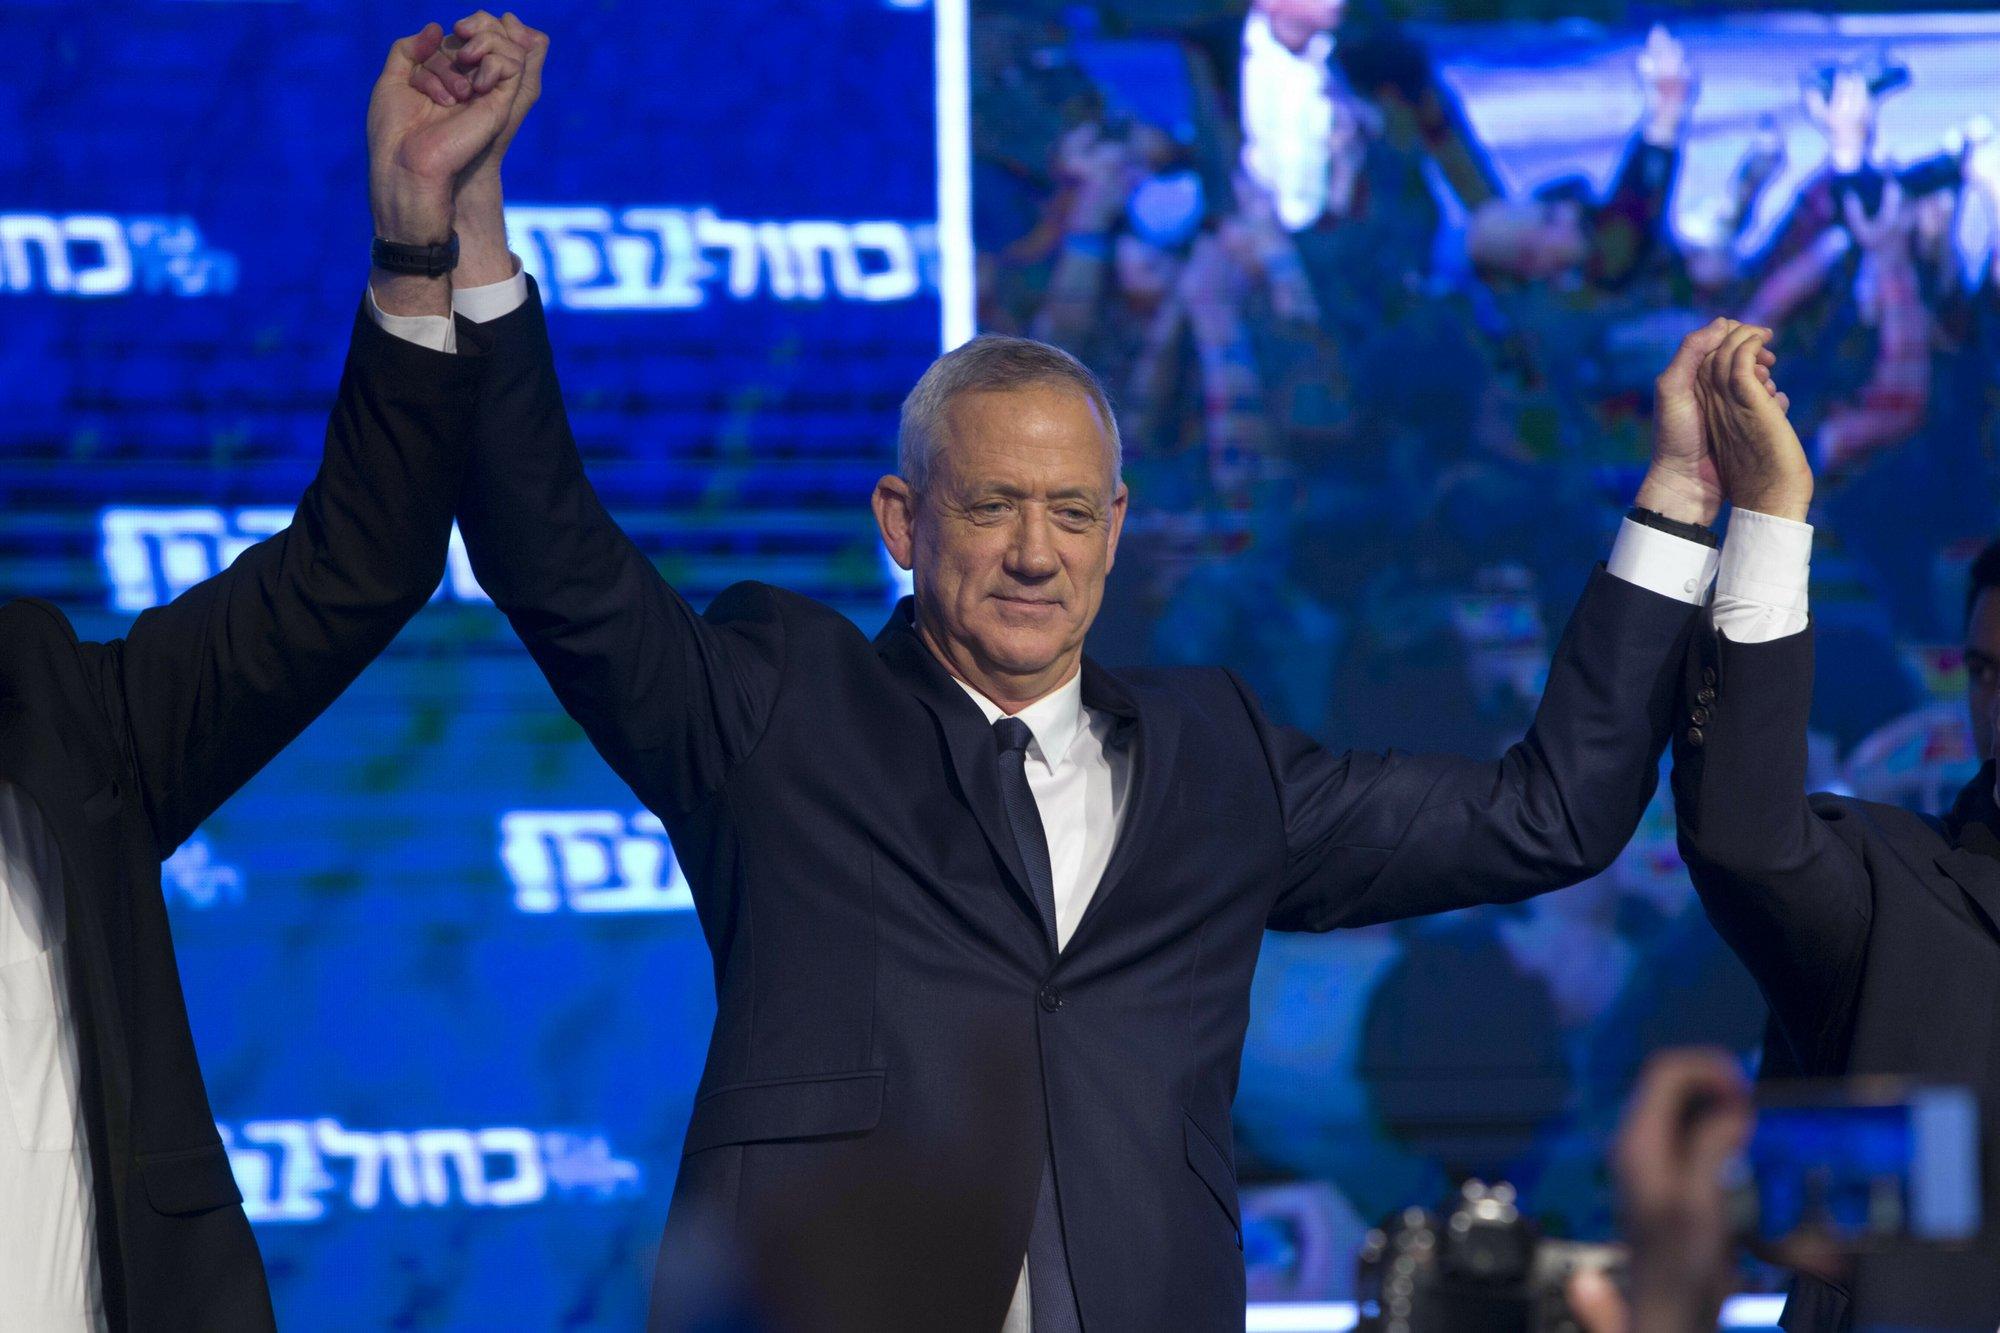 Israeli exit polls show Netanyahu, main rival in tight race